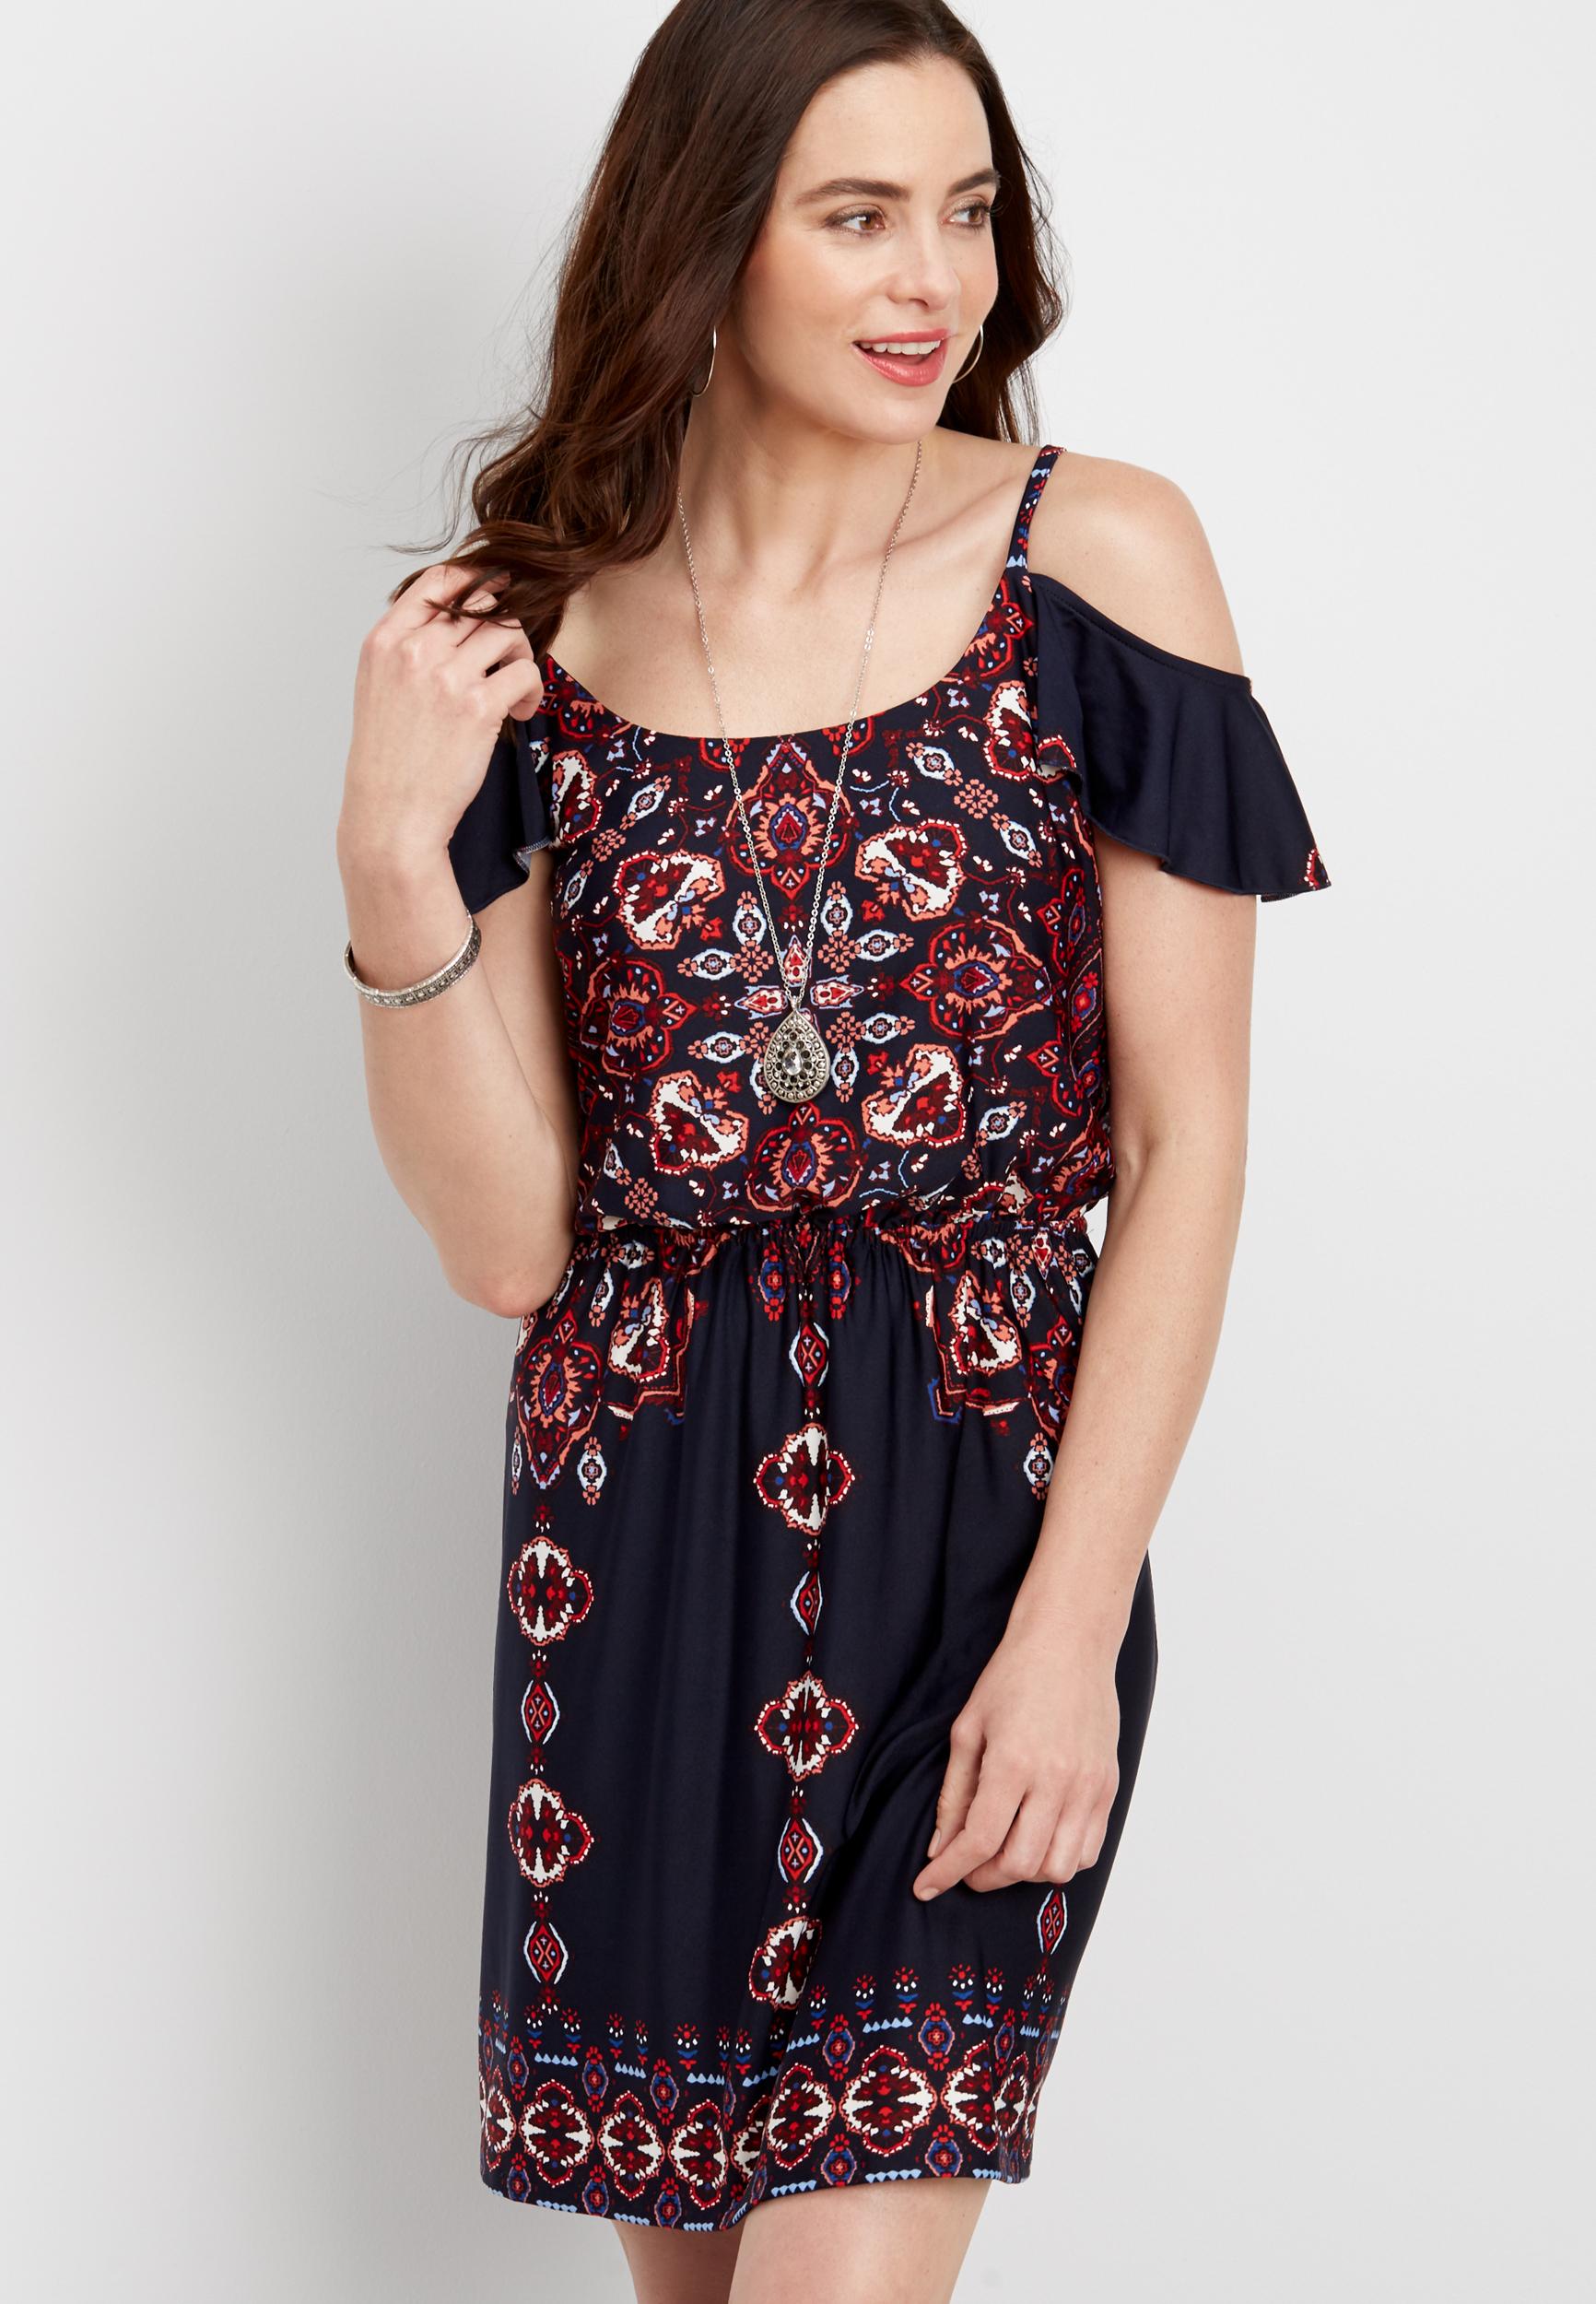 Ruffled Cold Shoulder Patterned Dress Maurices